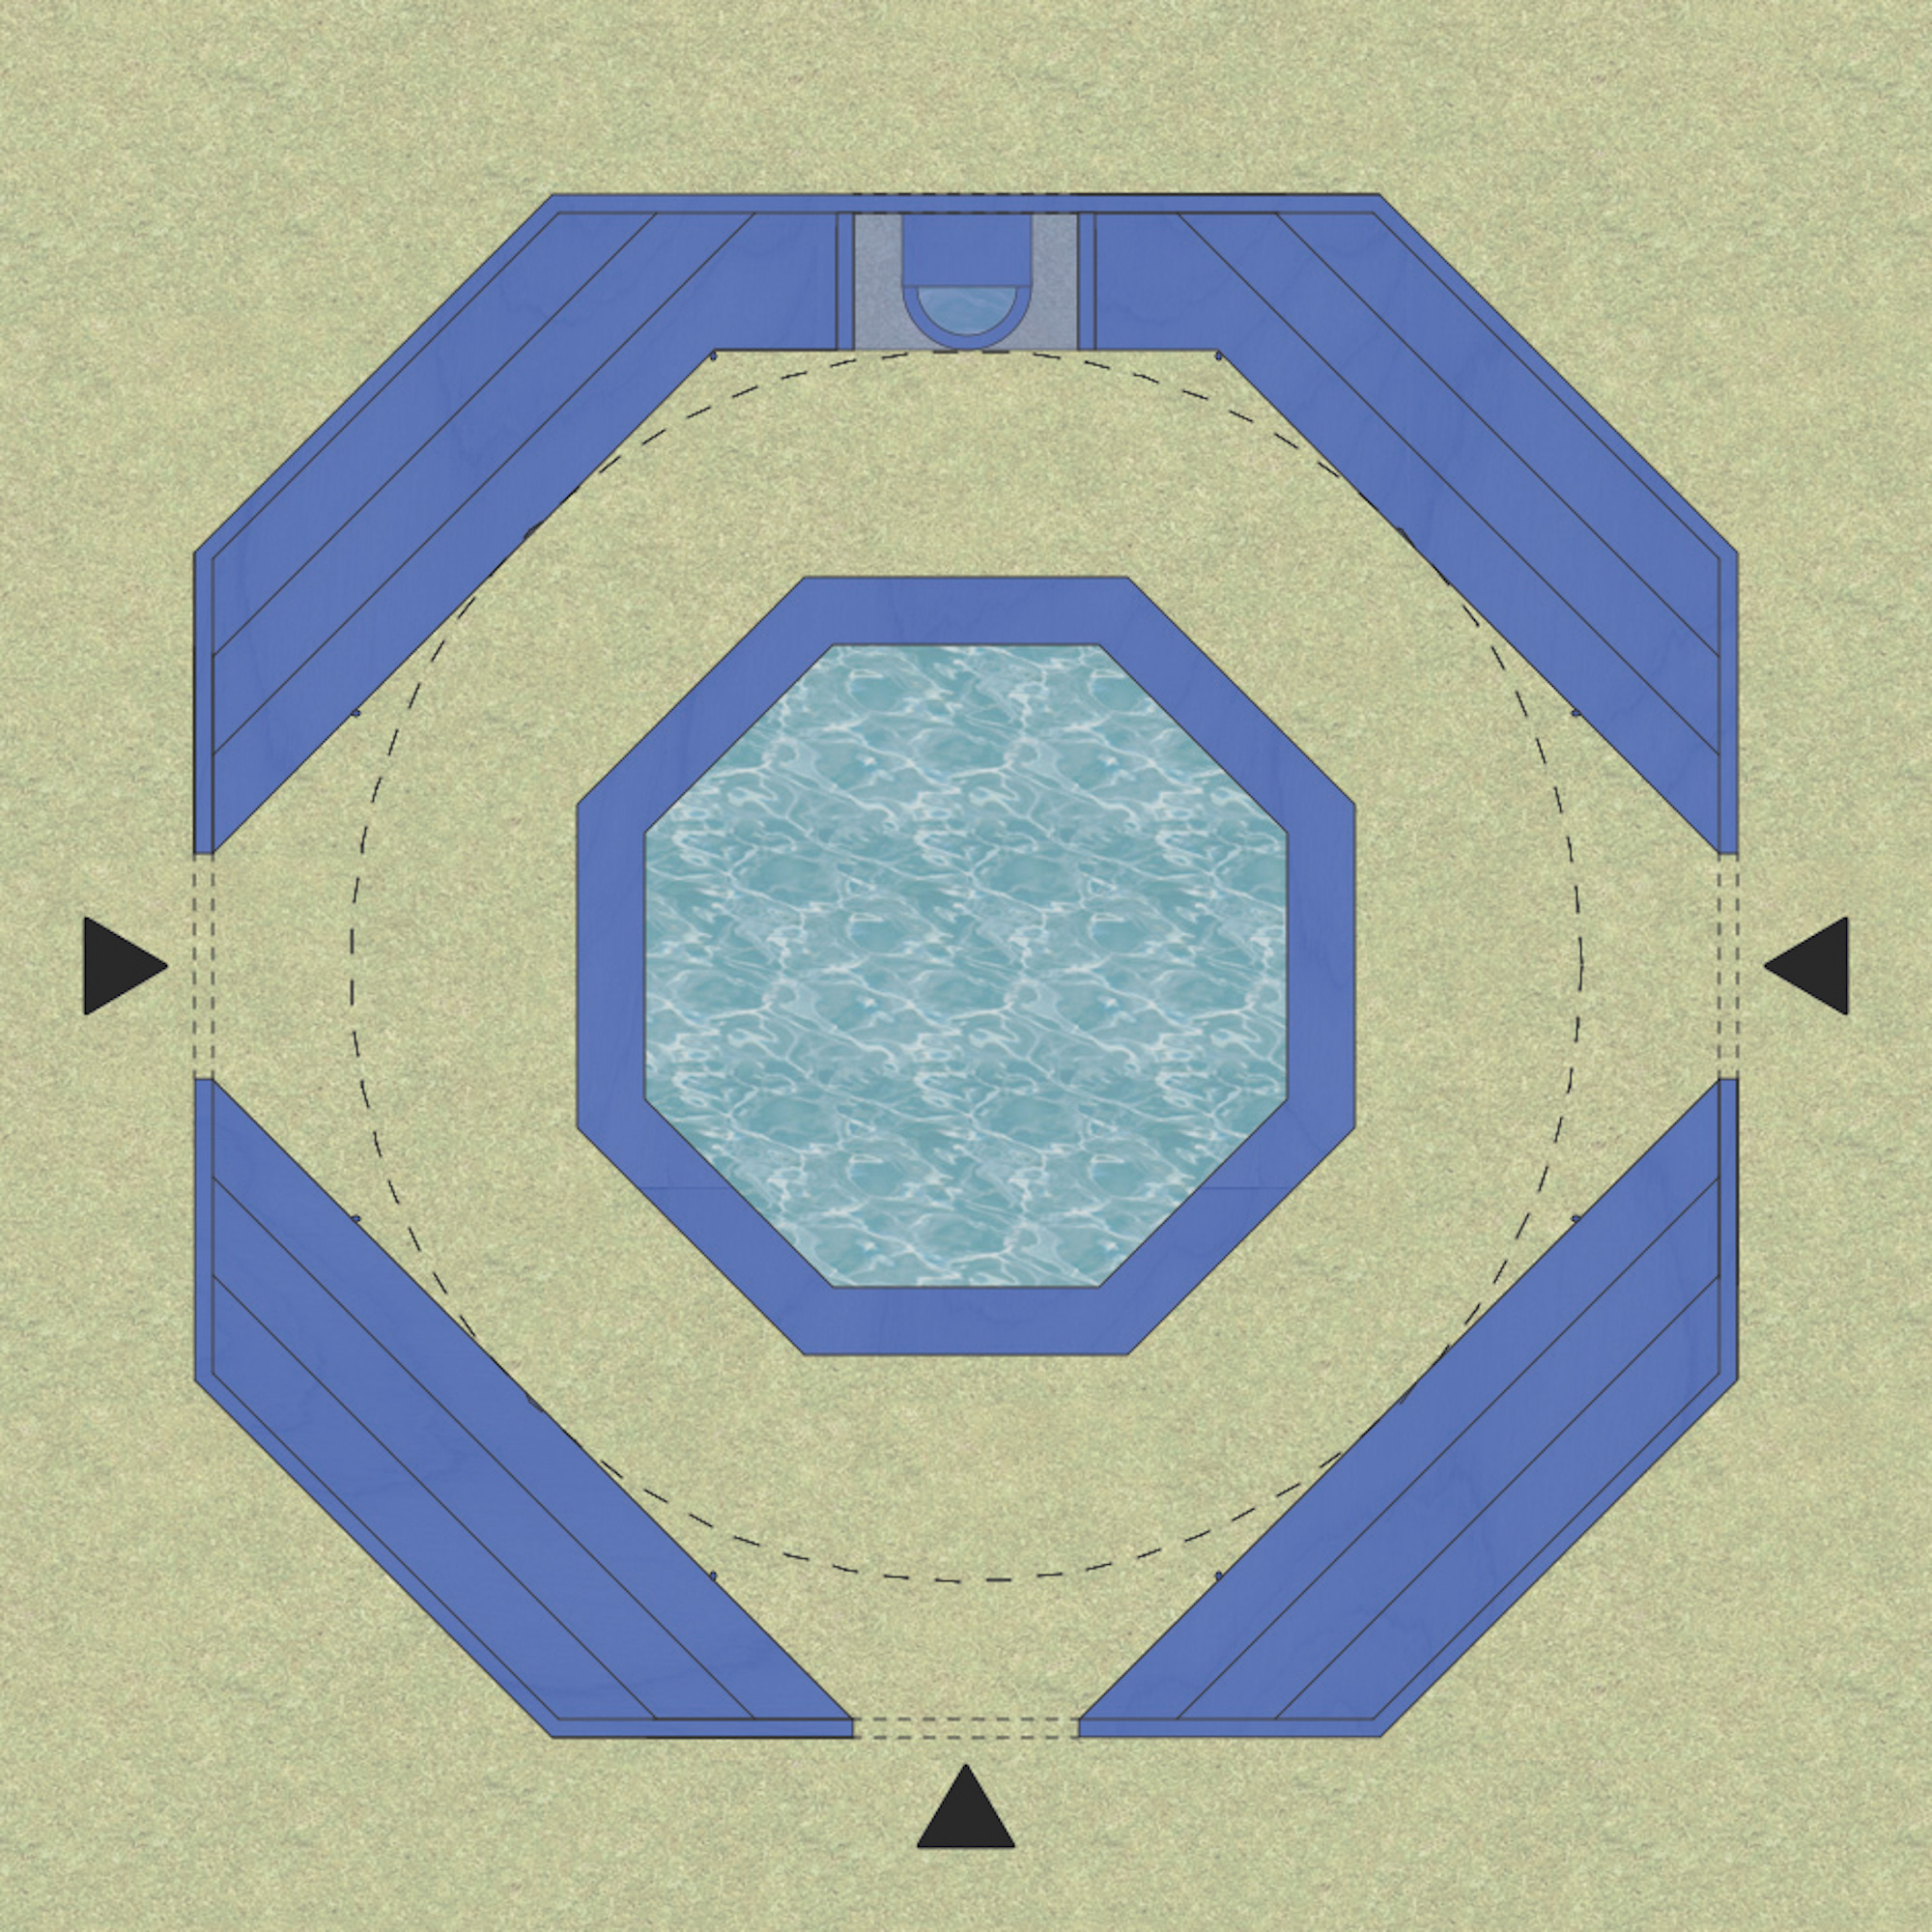 PLAN-Ground Floor.jpg